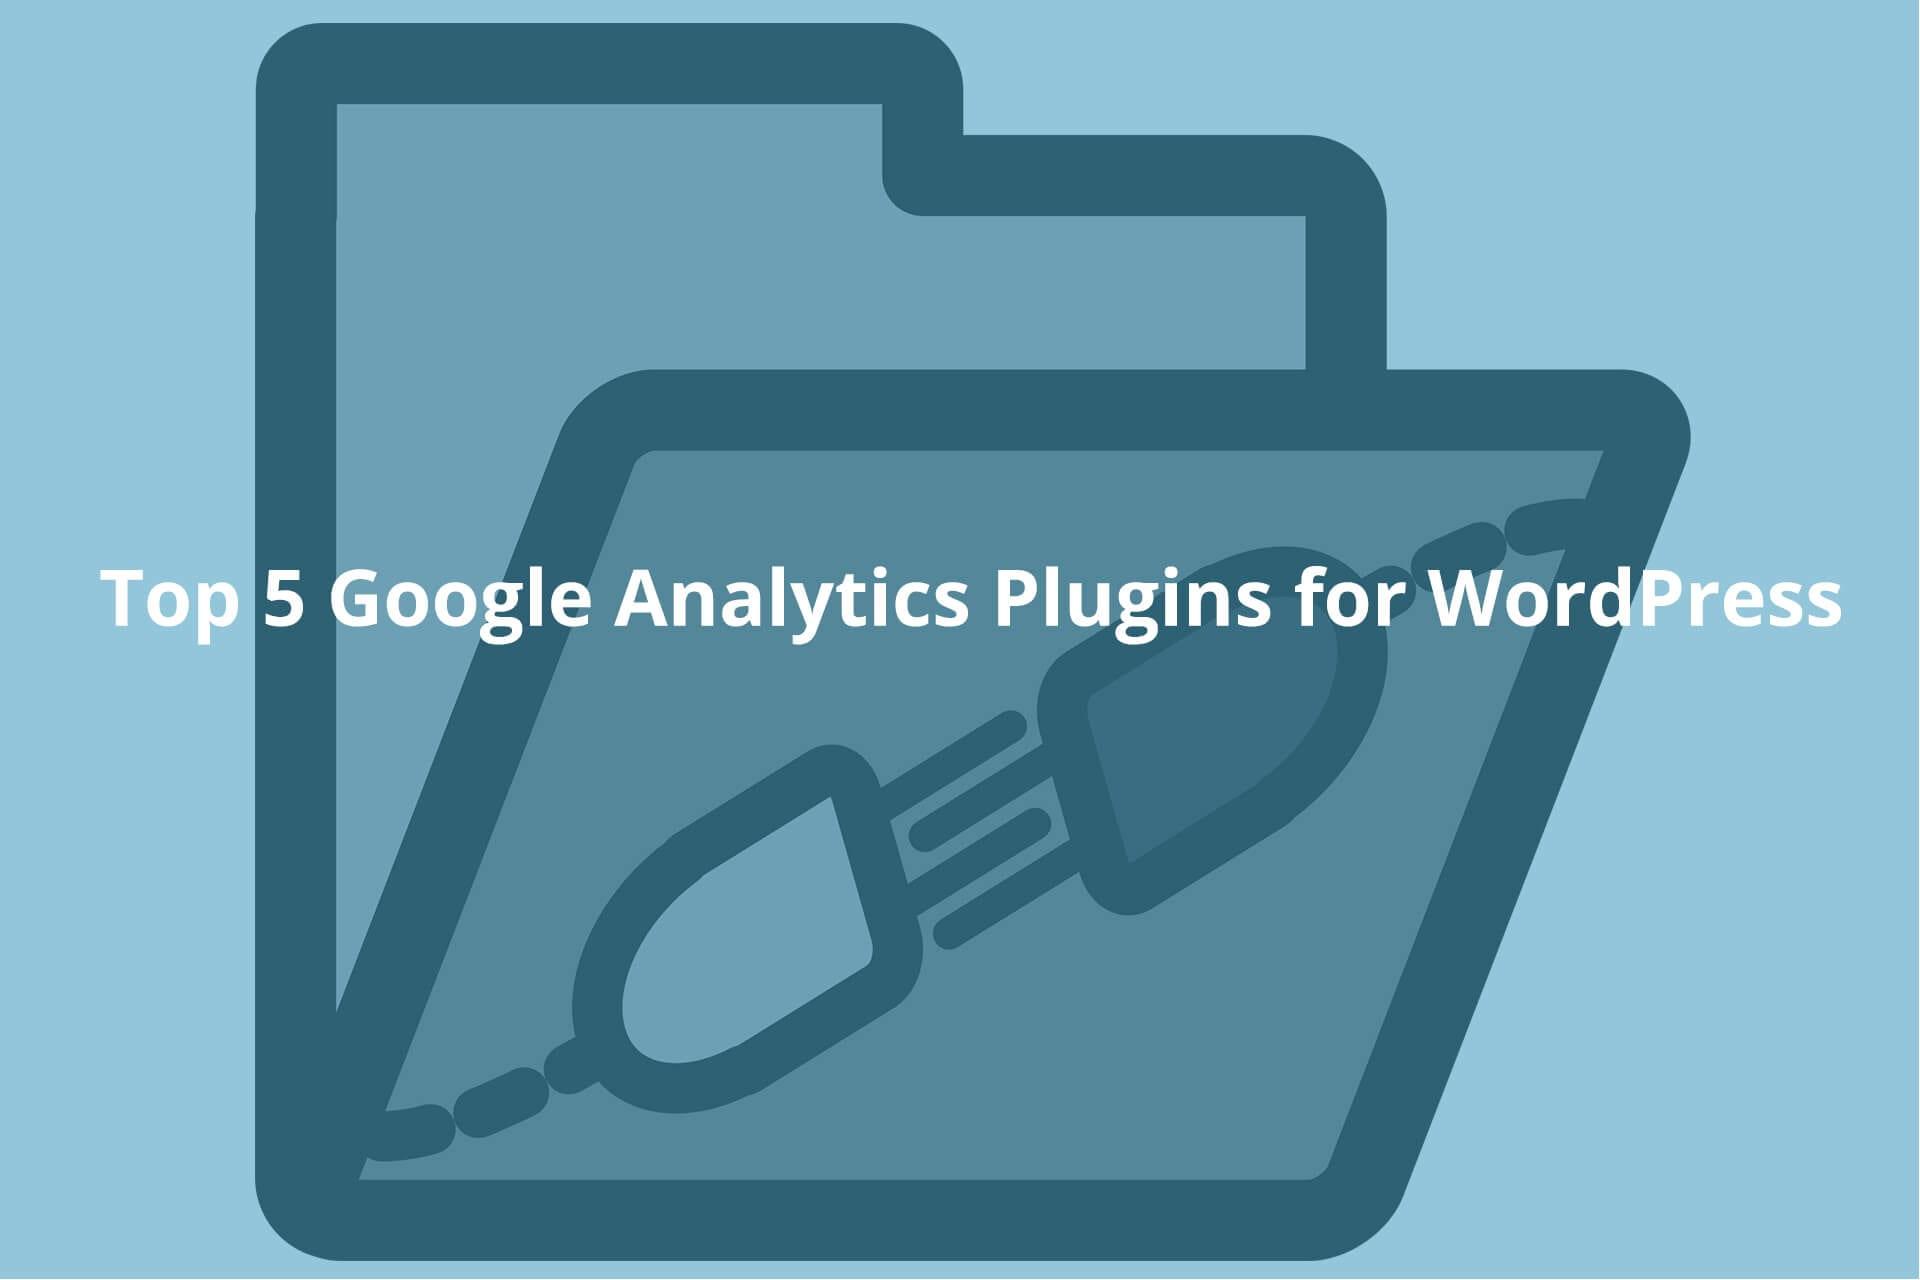 Top_5_Google_Analytics_Plugins_for_WordPress